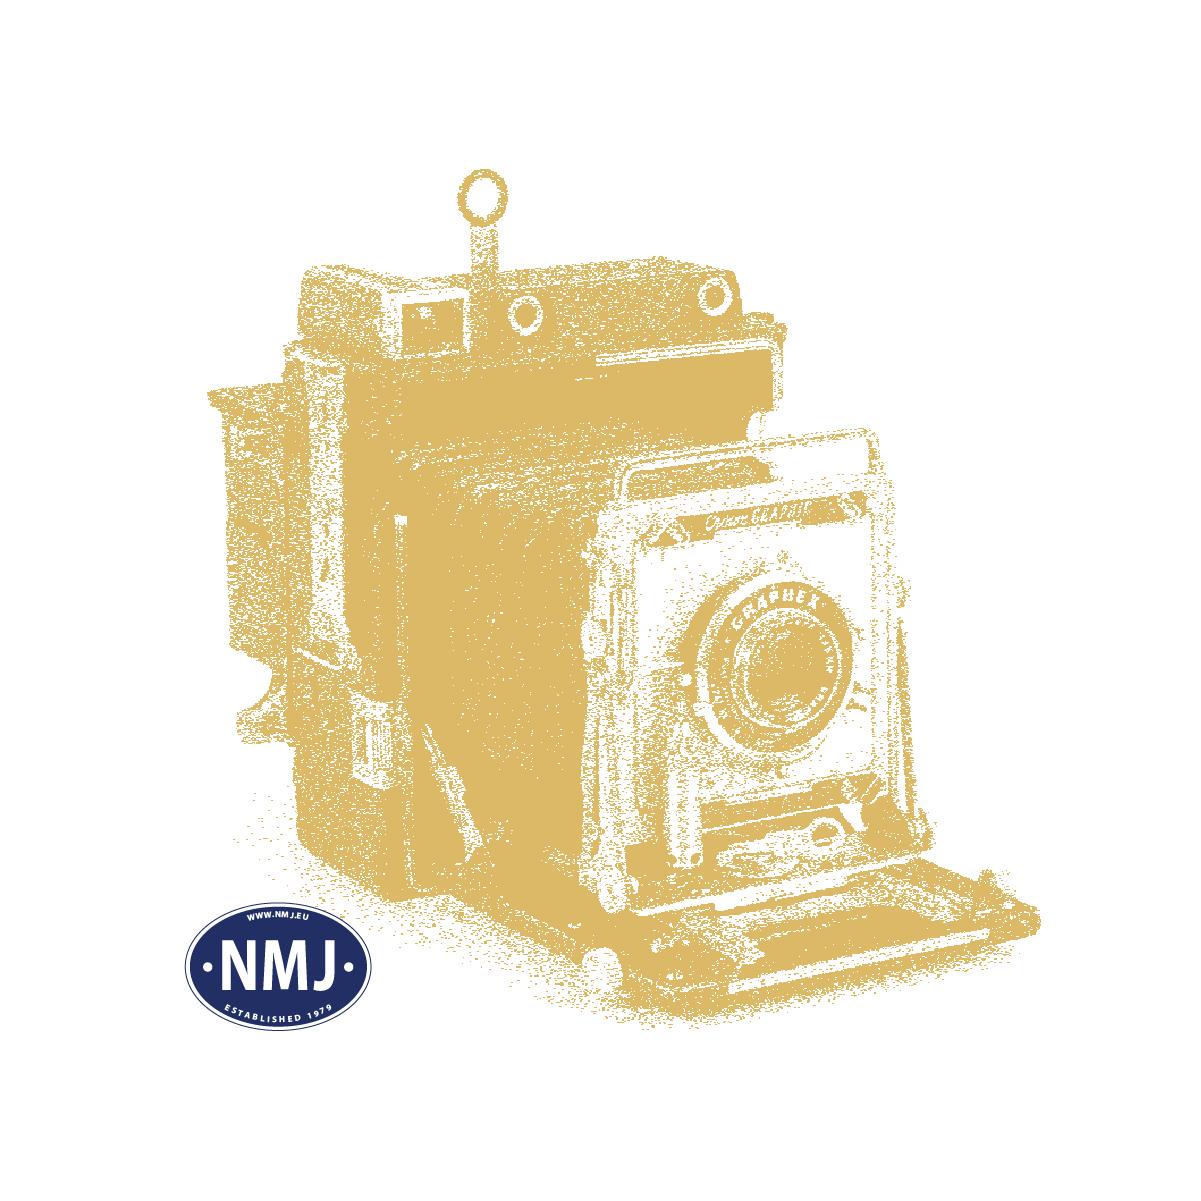 NMJT199.103 - NMJ Topline Bahnreisende, stehend , Set #1